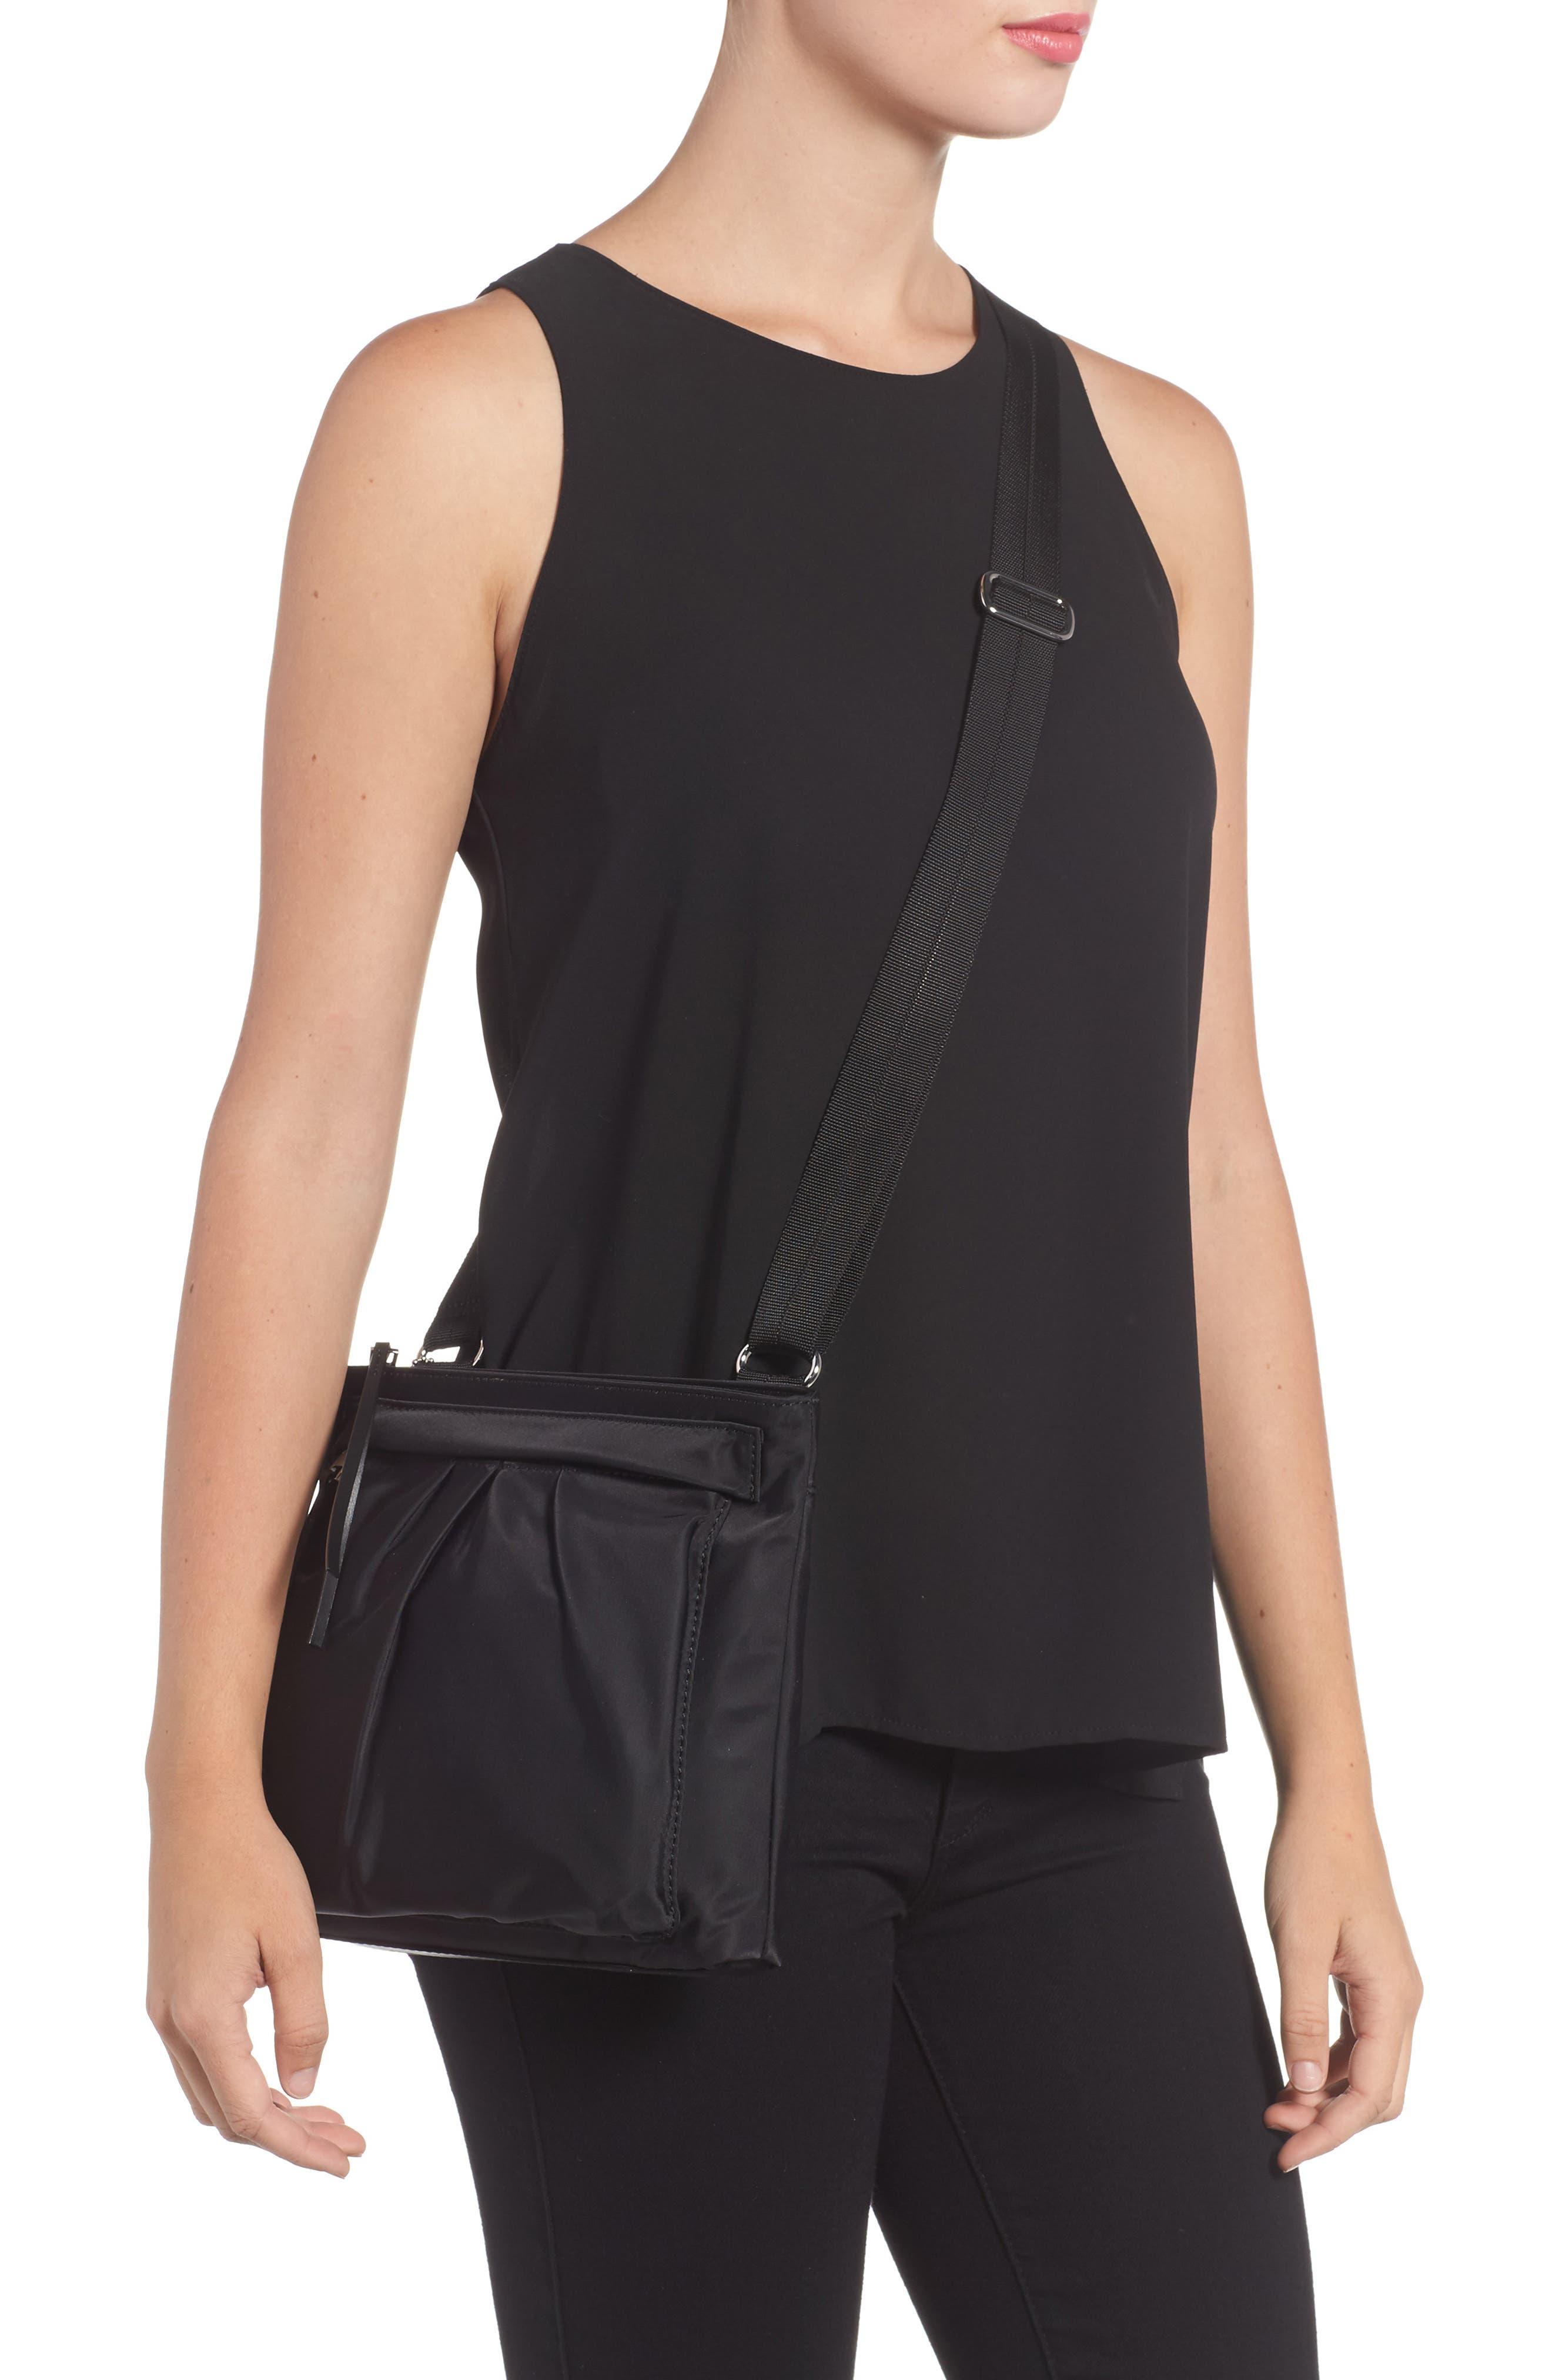 Jordan Bedford Nylon Crossbody Bag,                             Alternate thumbnail 2, color,                             008